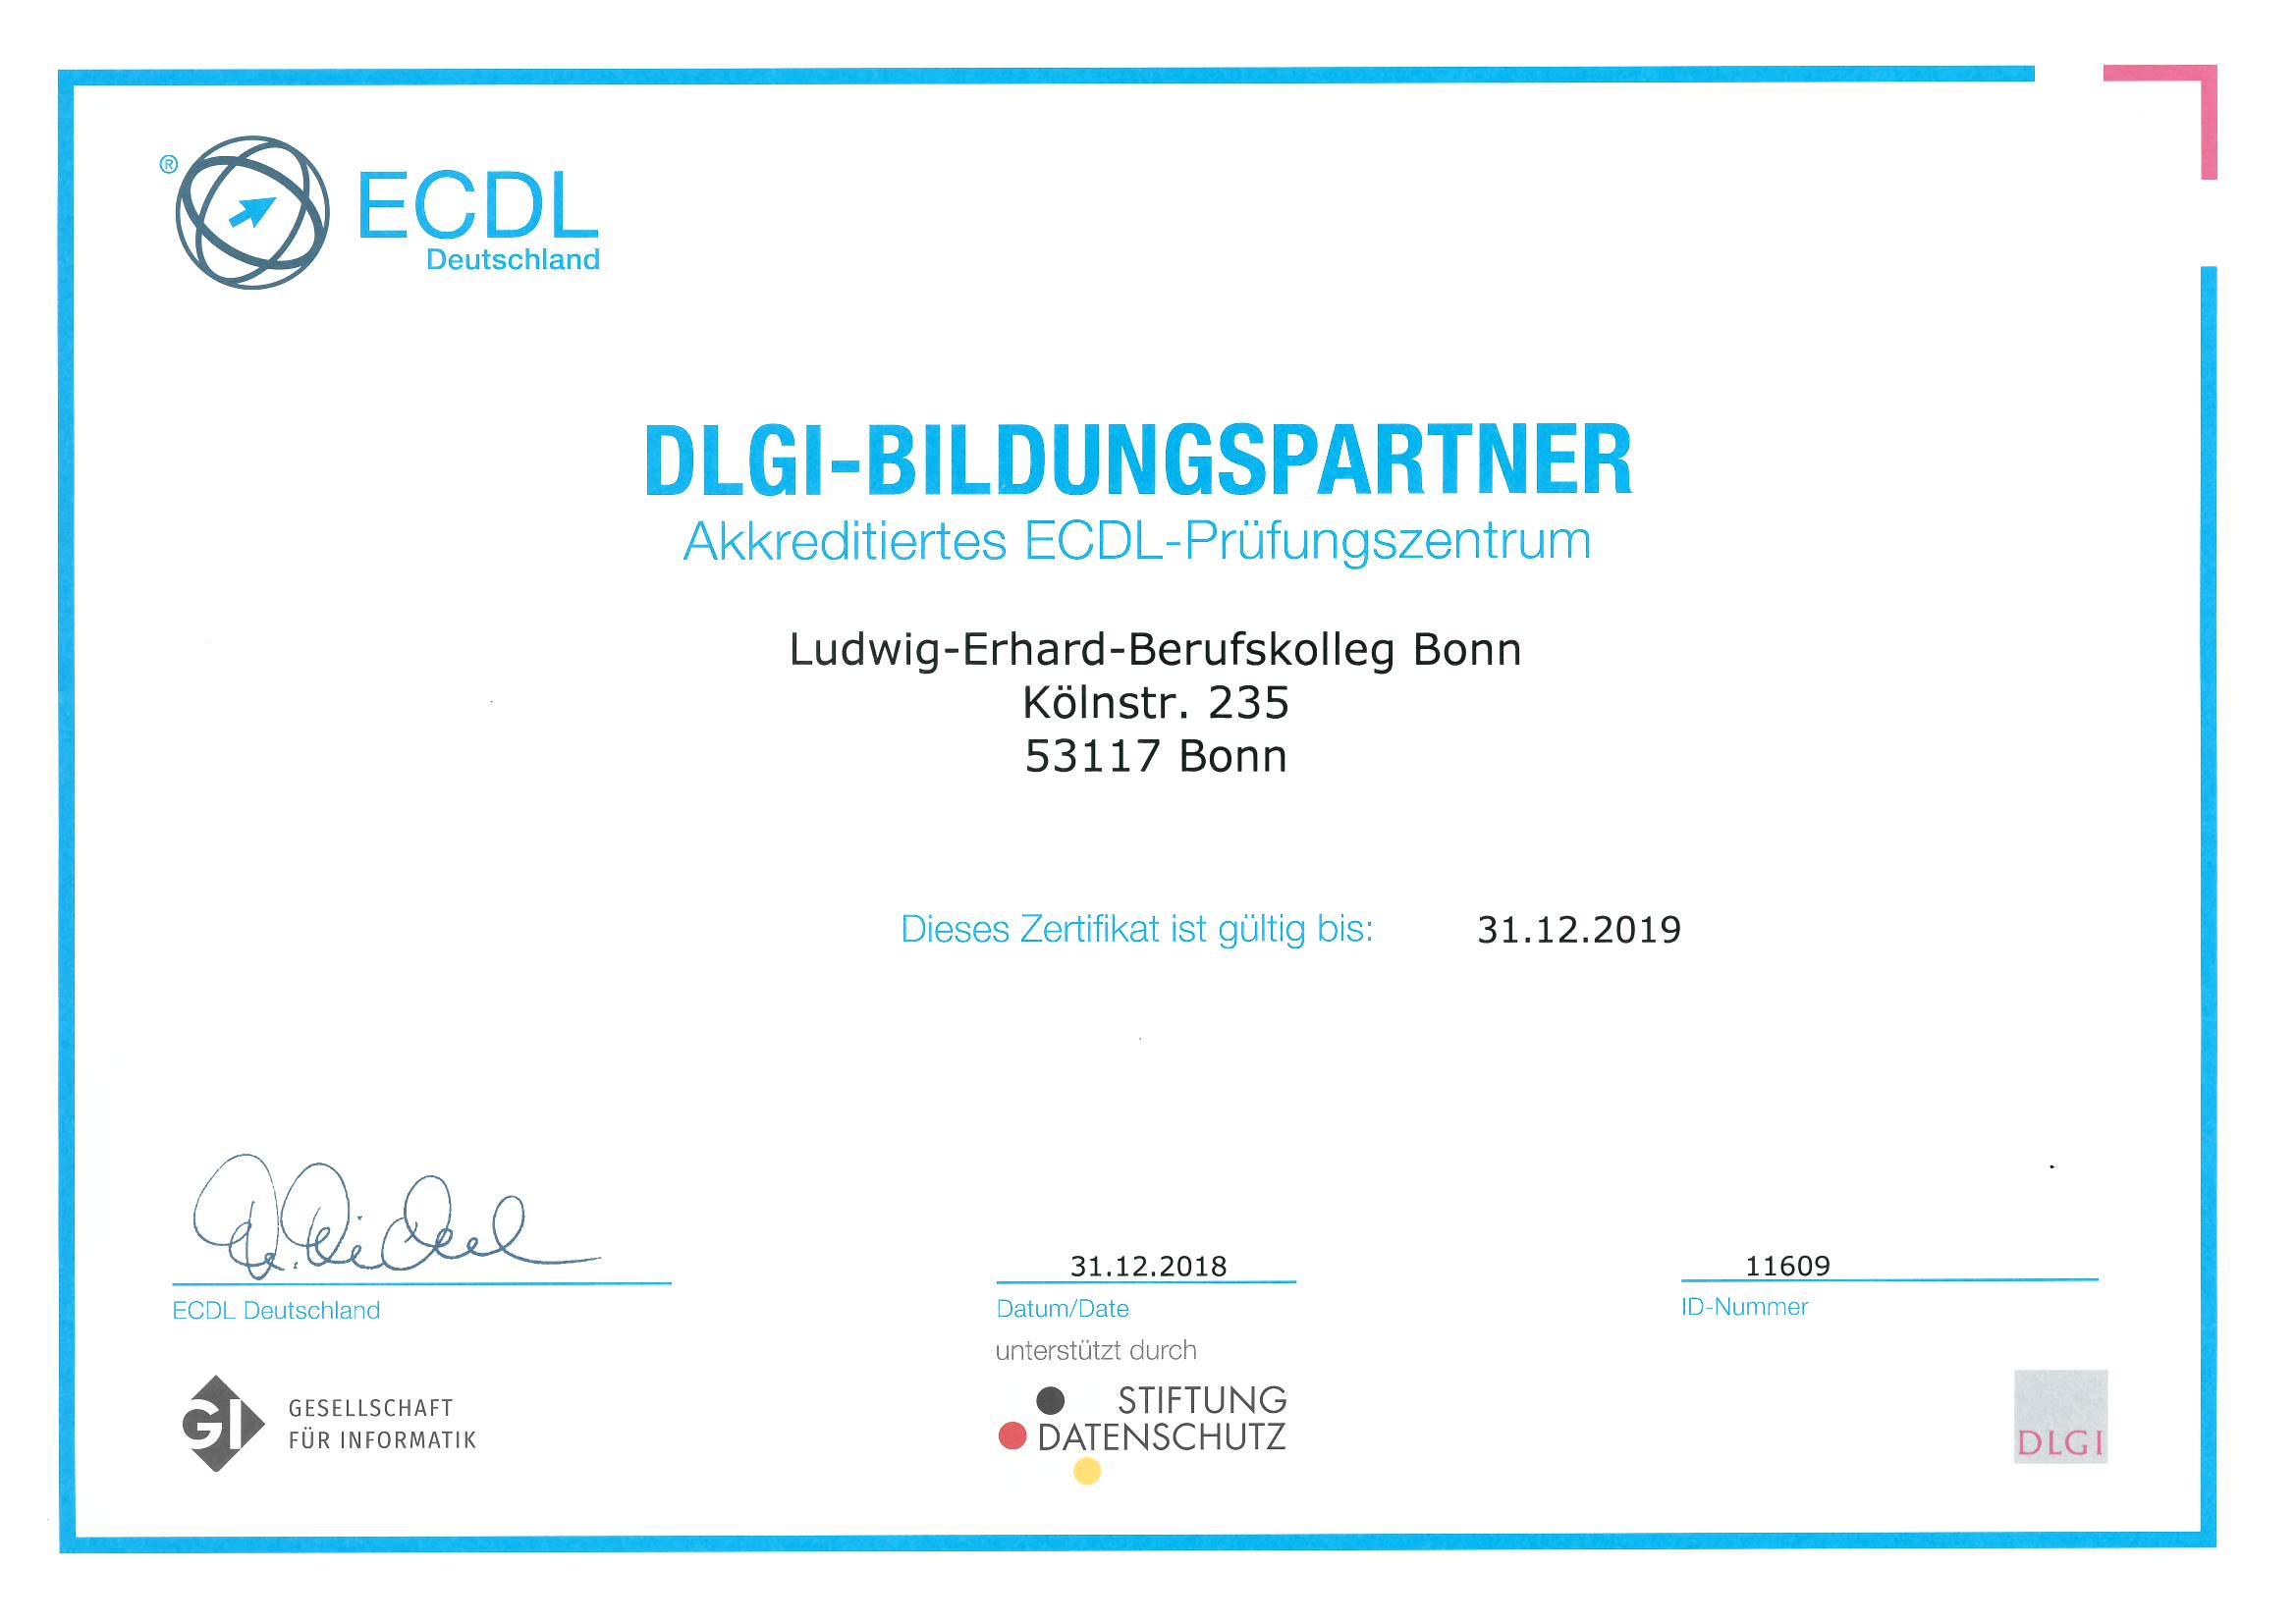 ECDL - Zertifikat